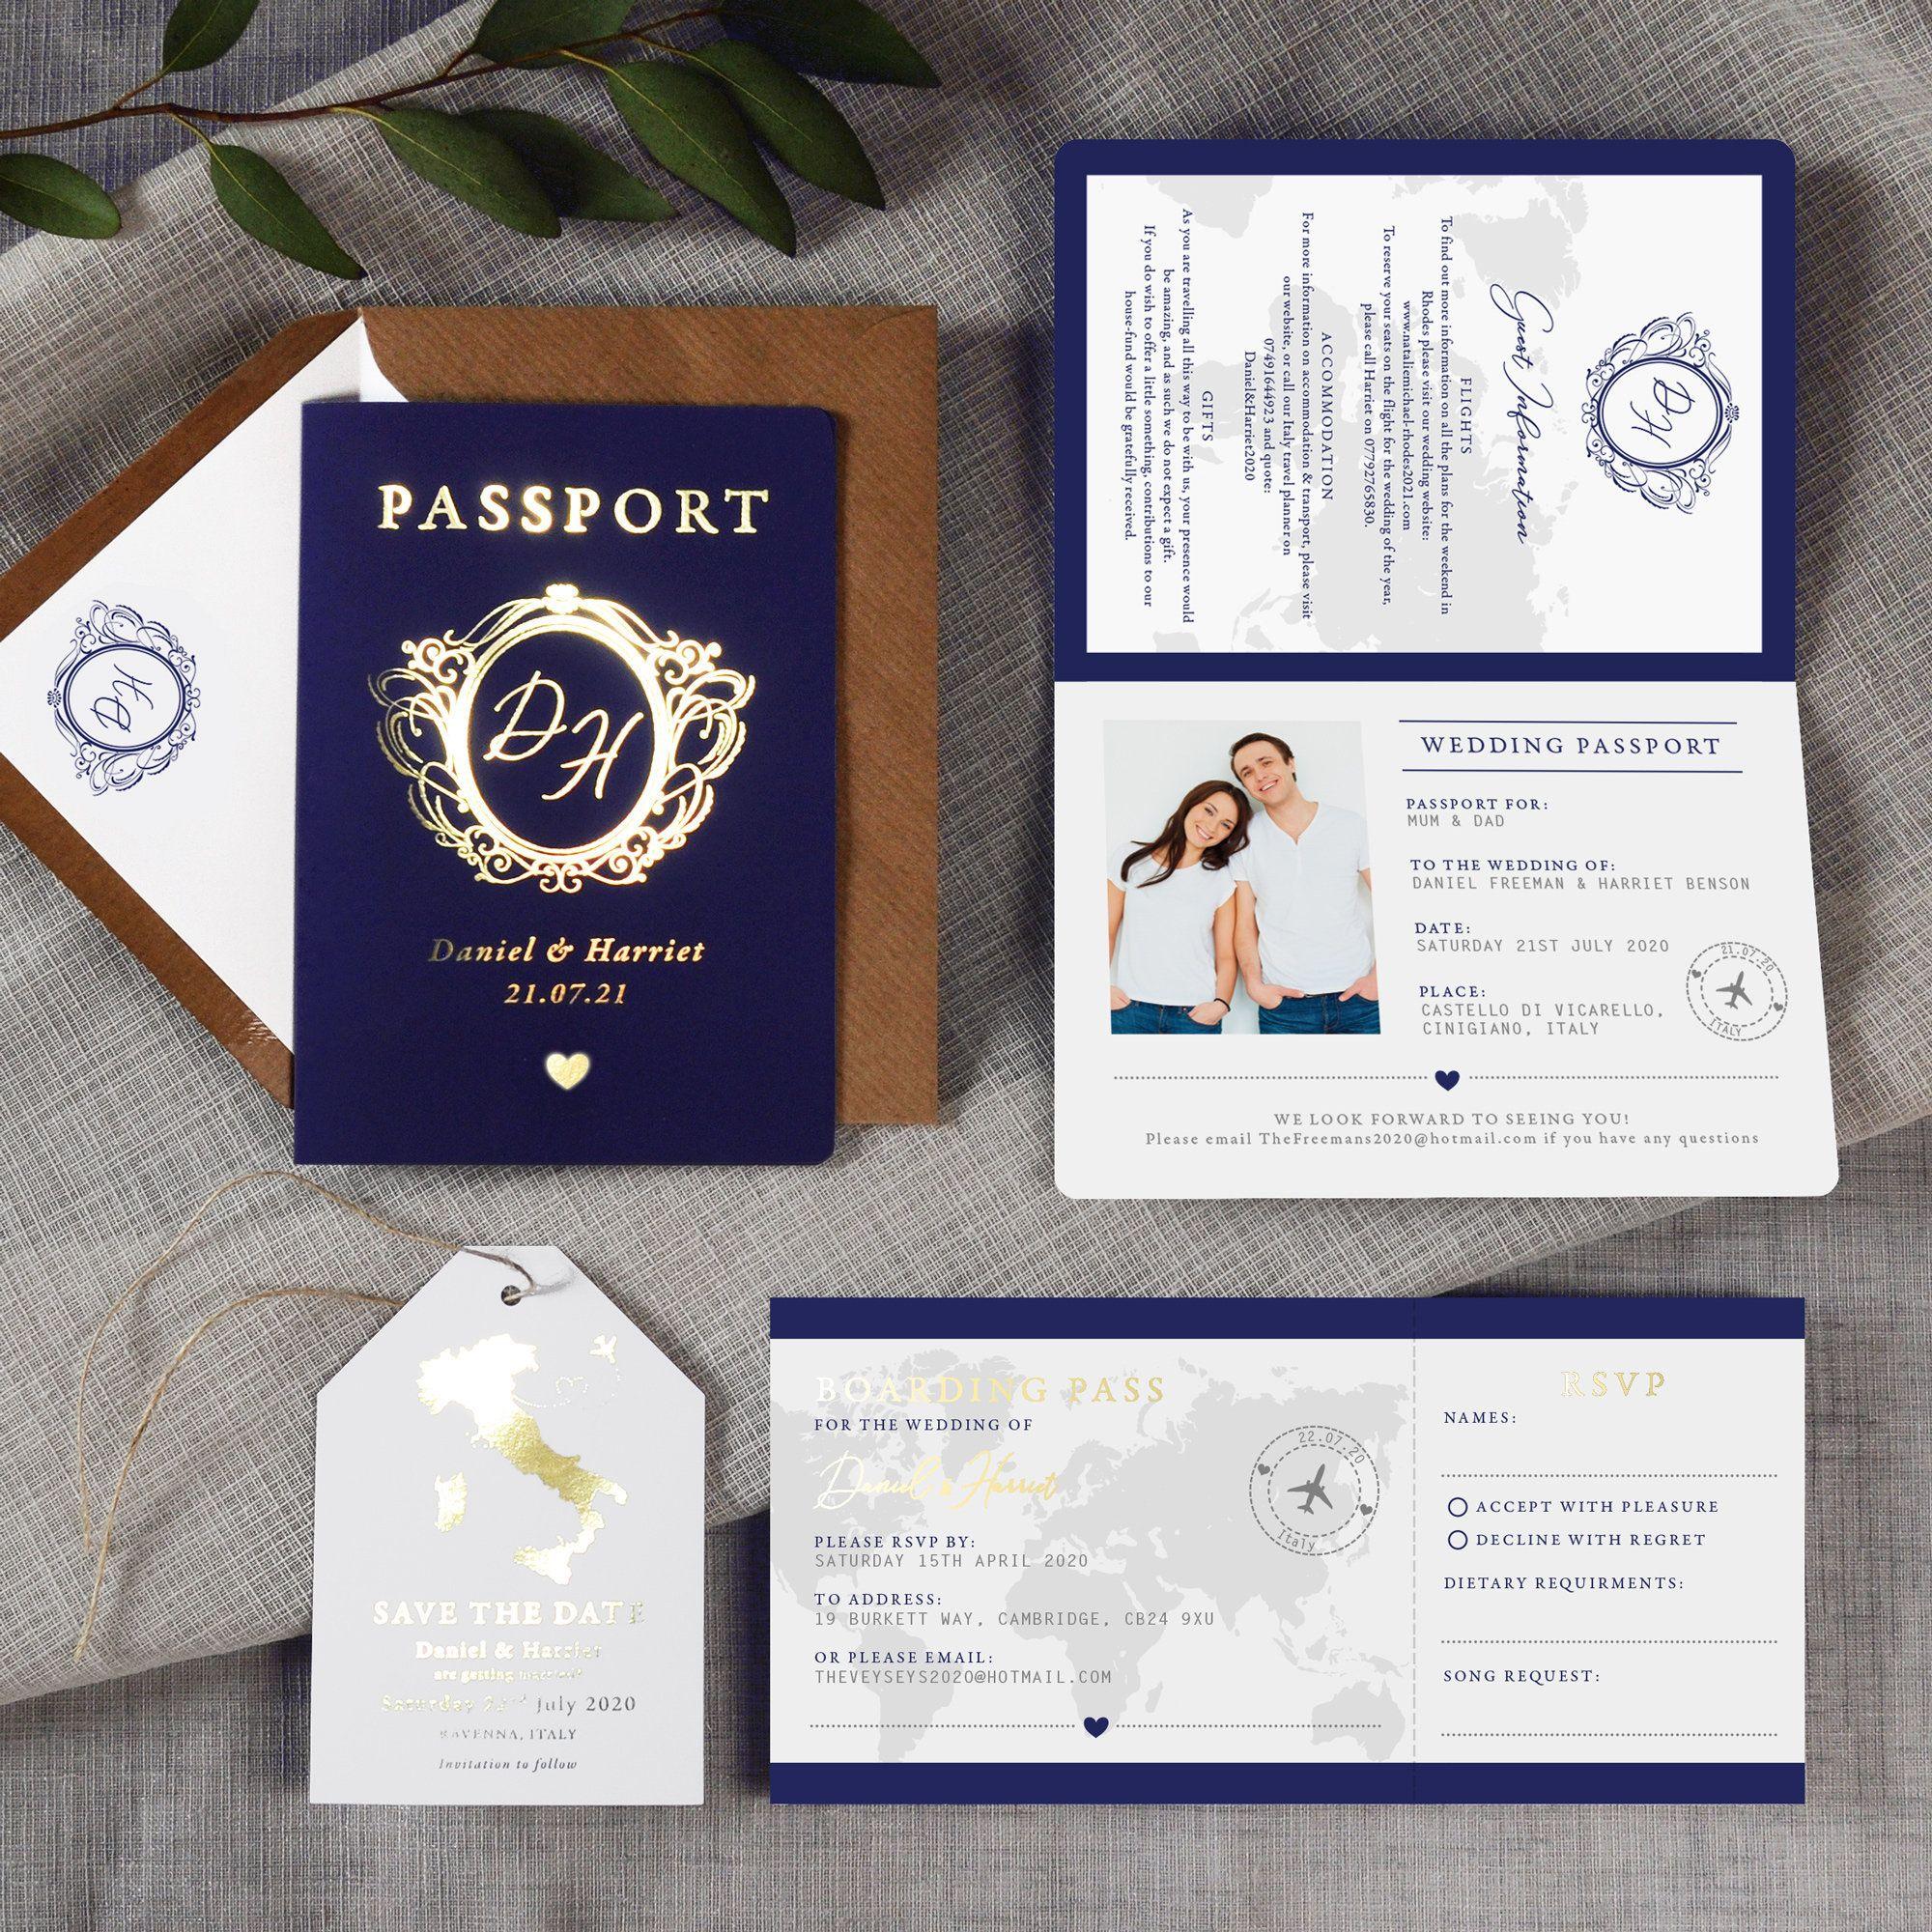 Passport Wedding Invitation, Boarding Pass RSVP, Luggage